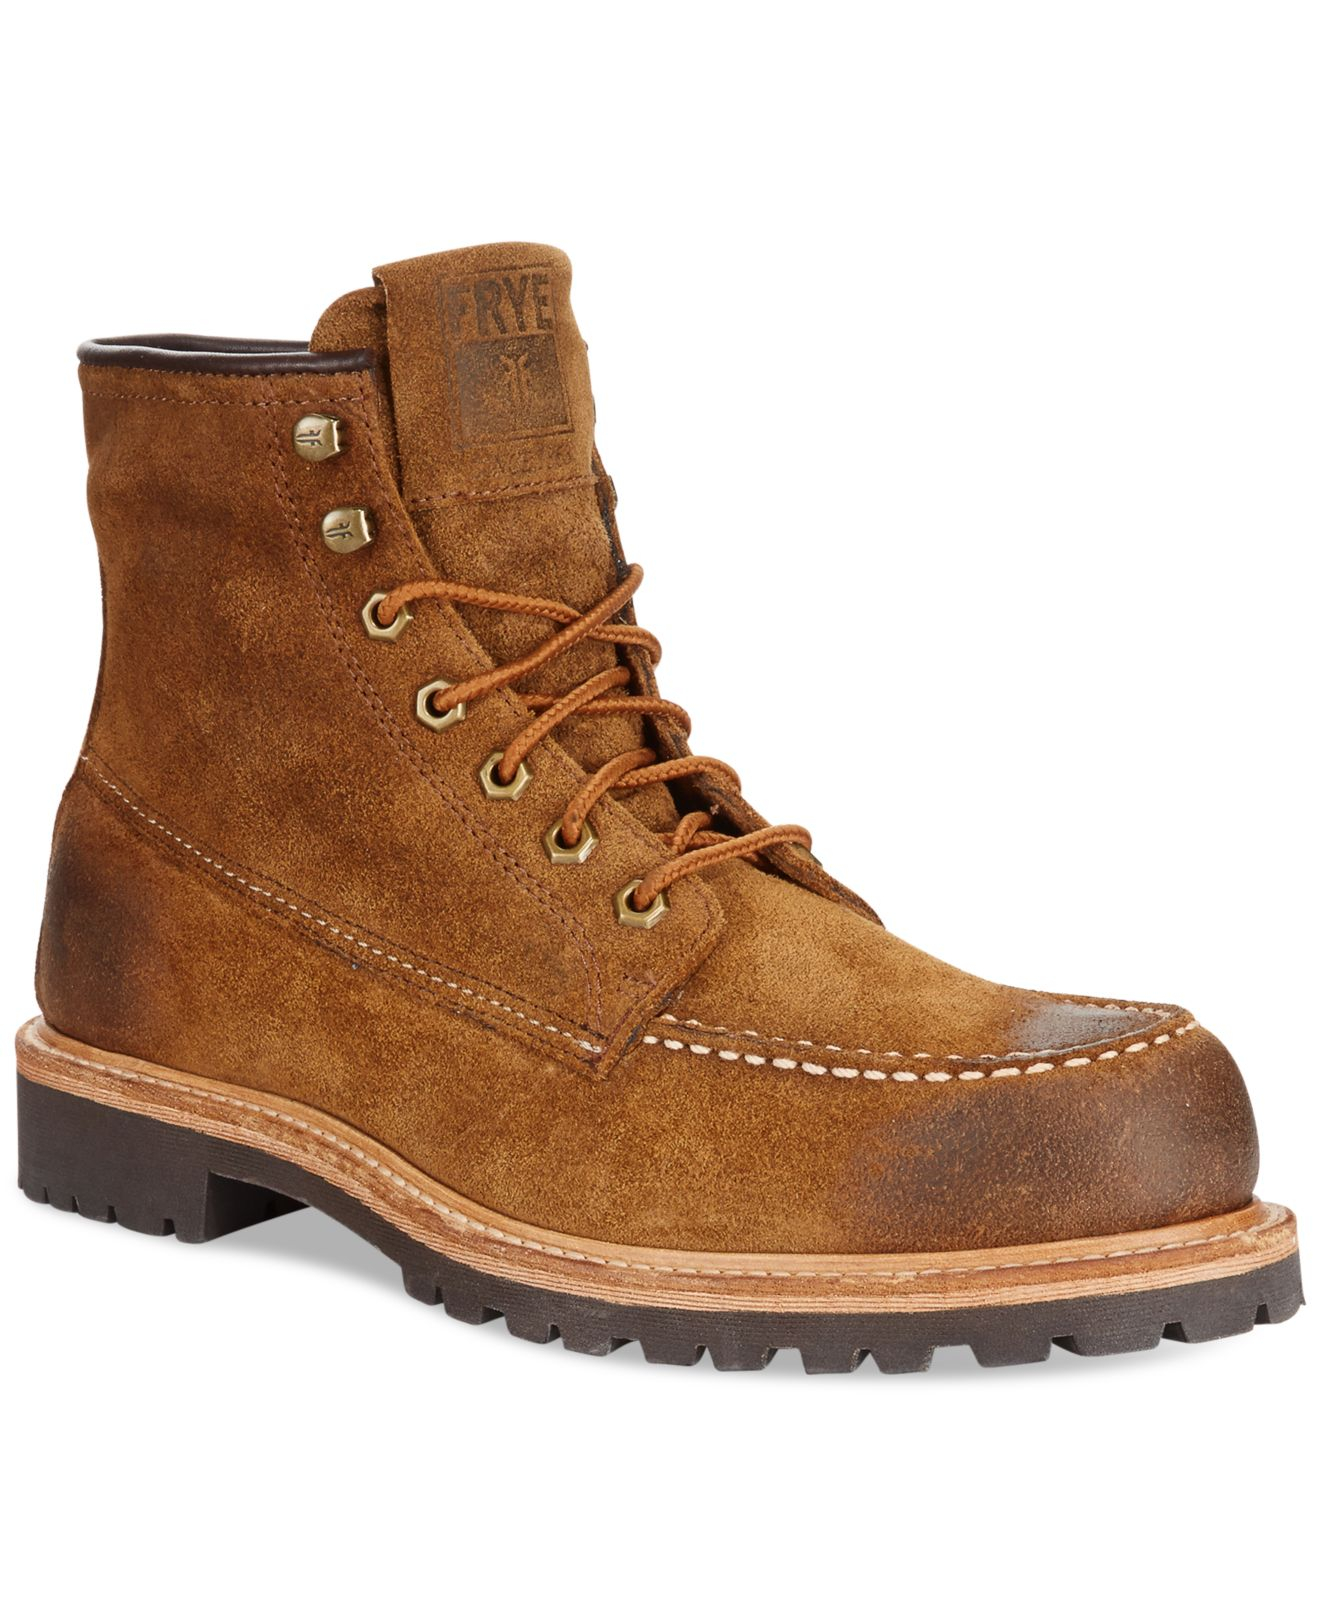 frye dakota mid boots in brown for lyst